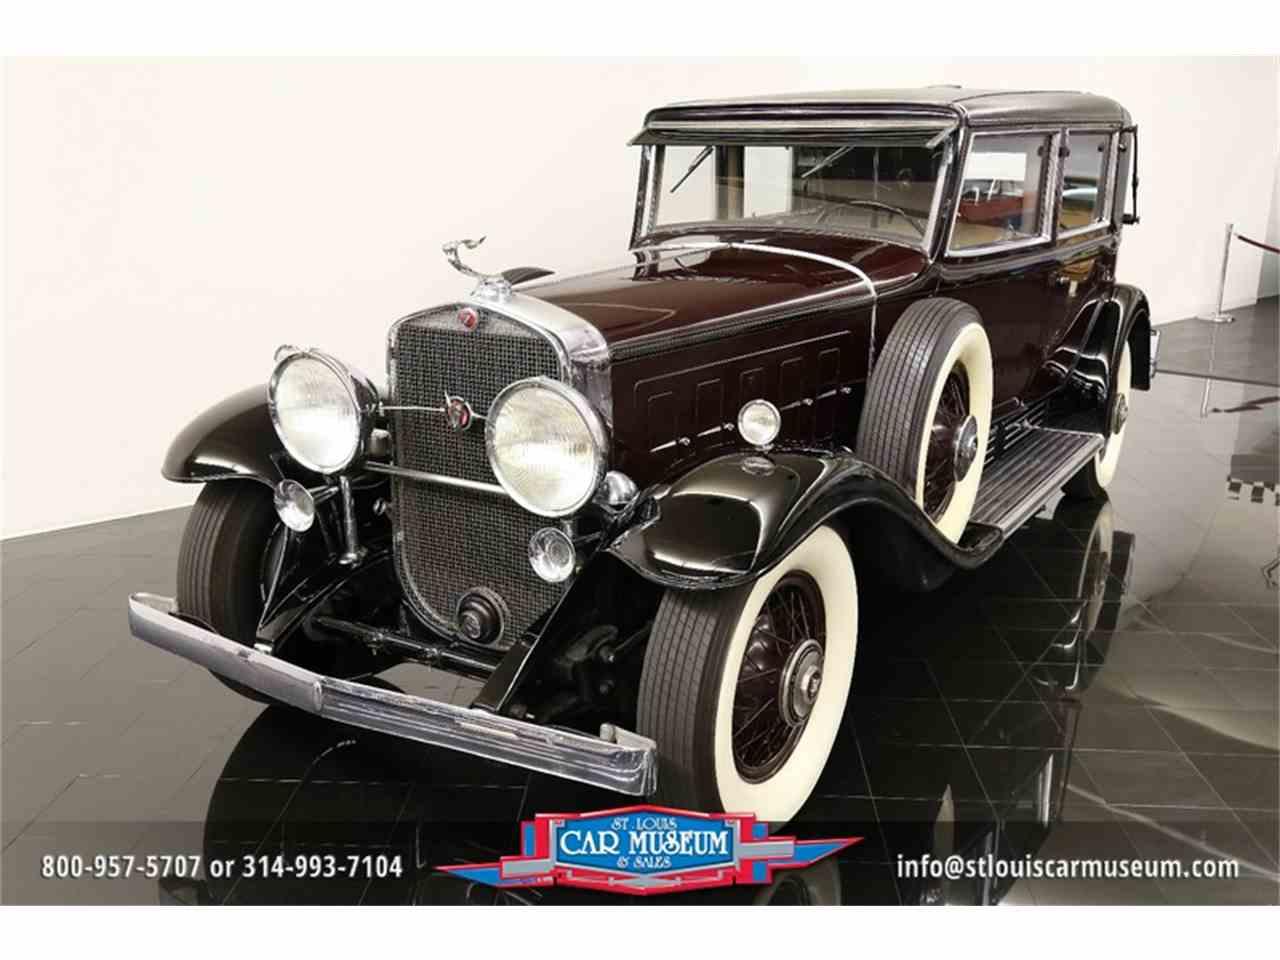 Large Picture of Classic 1931 Cadillac V-16 Madam X Landau Sedan located in St. Louis Missouri - $374,900.00 - JSU3